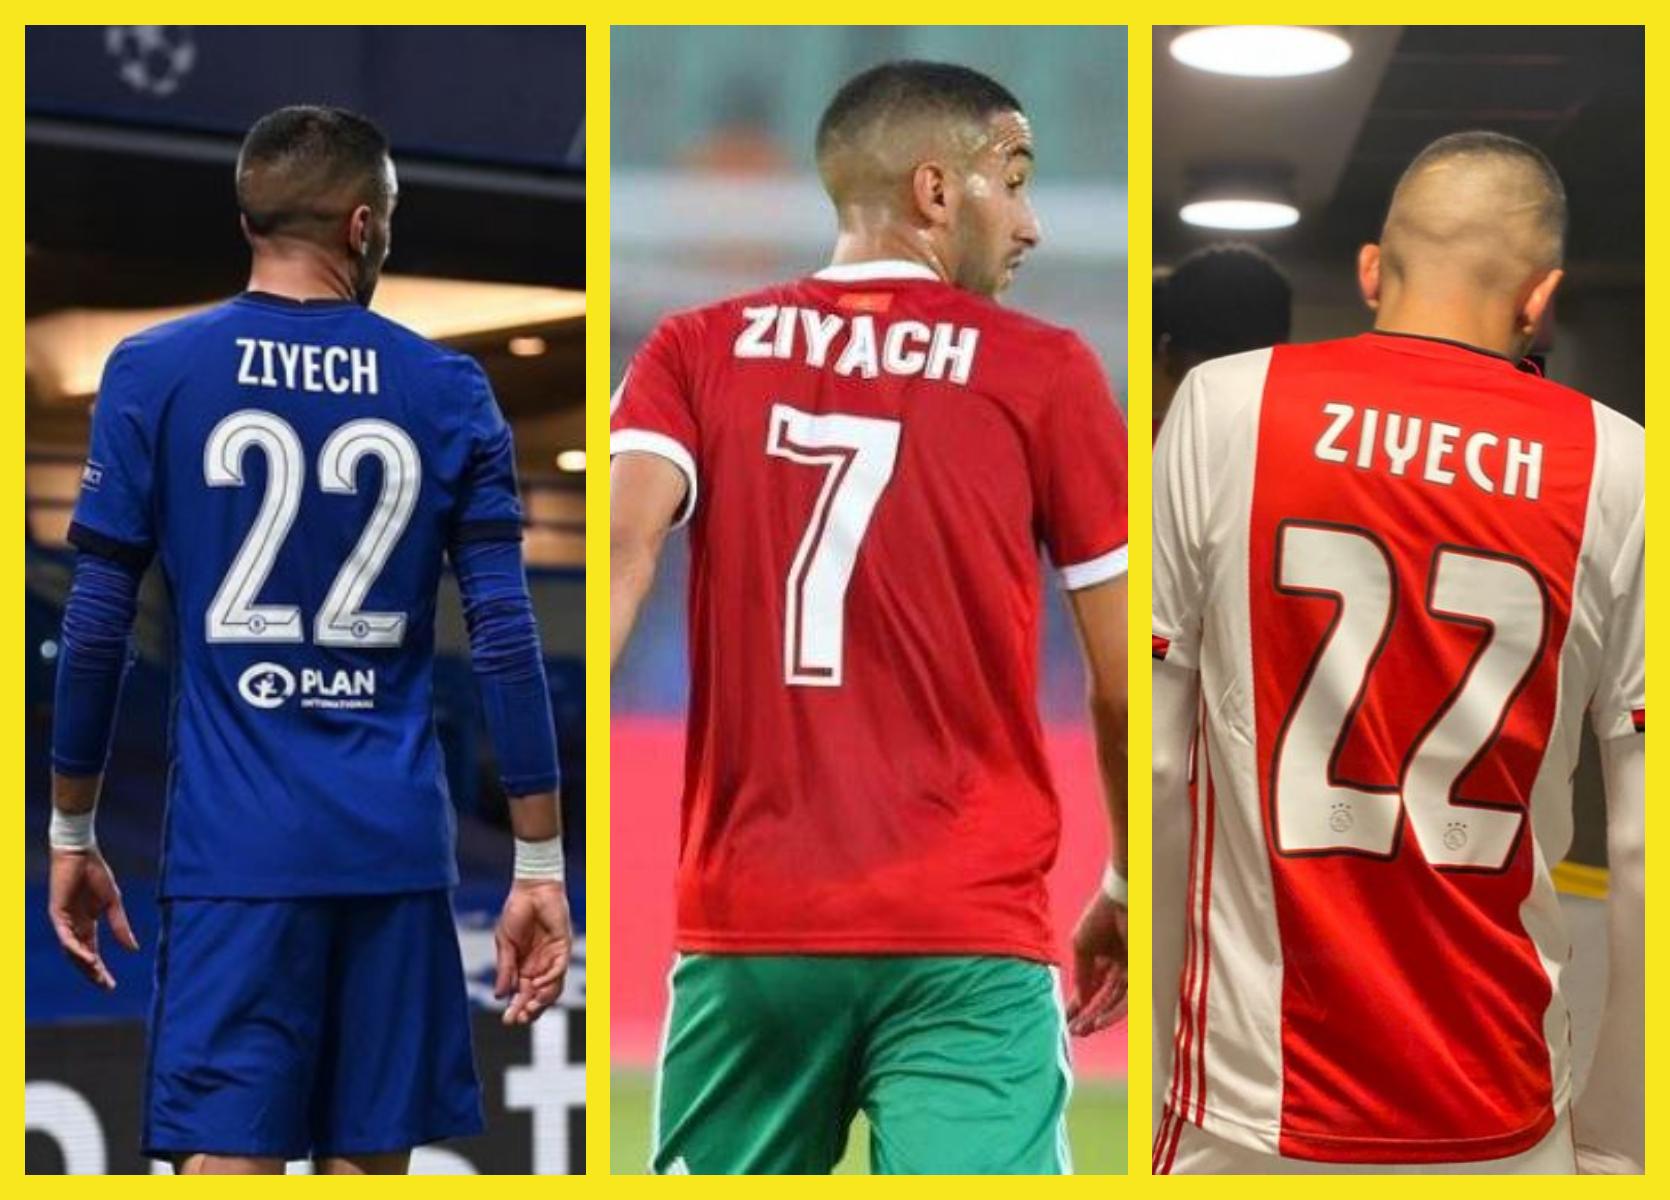 ziyech, ziyach, chelsea, ajax, Maroc, maillot ziyech, maillot zyach, hakim ziyech, hakim ziyach, tenu ziyech,زياش, حكيم زياش, تشيلسي ,المغرب